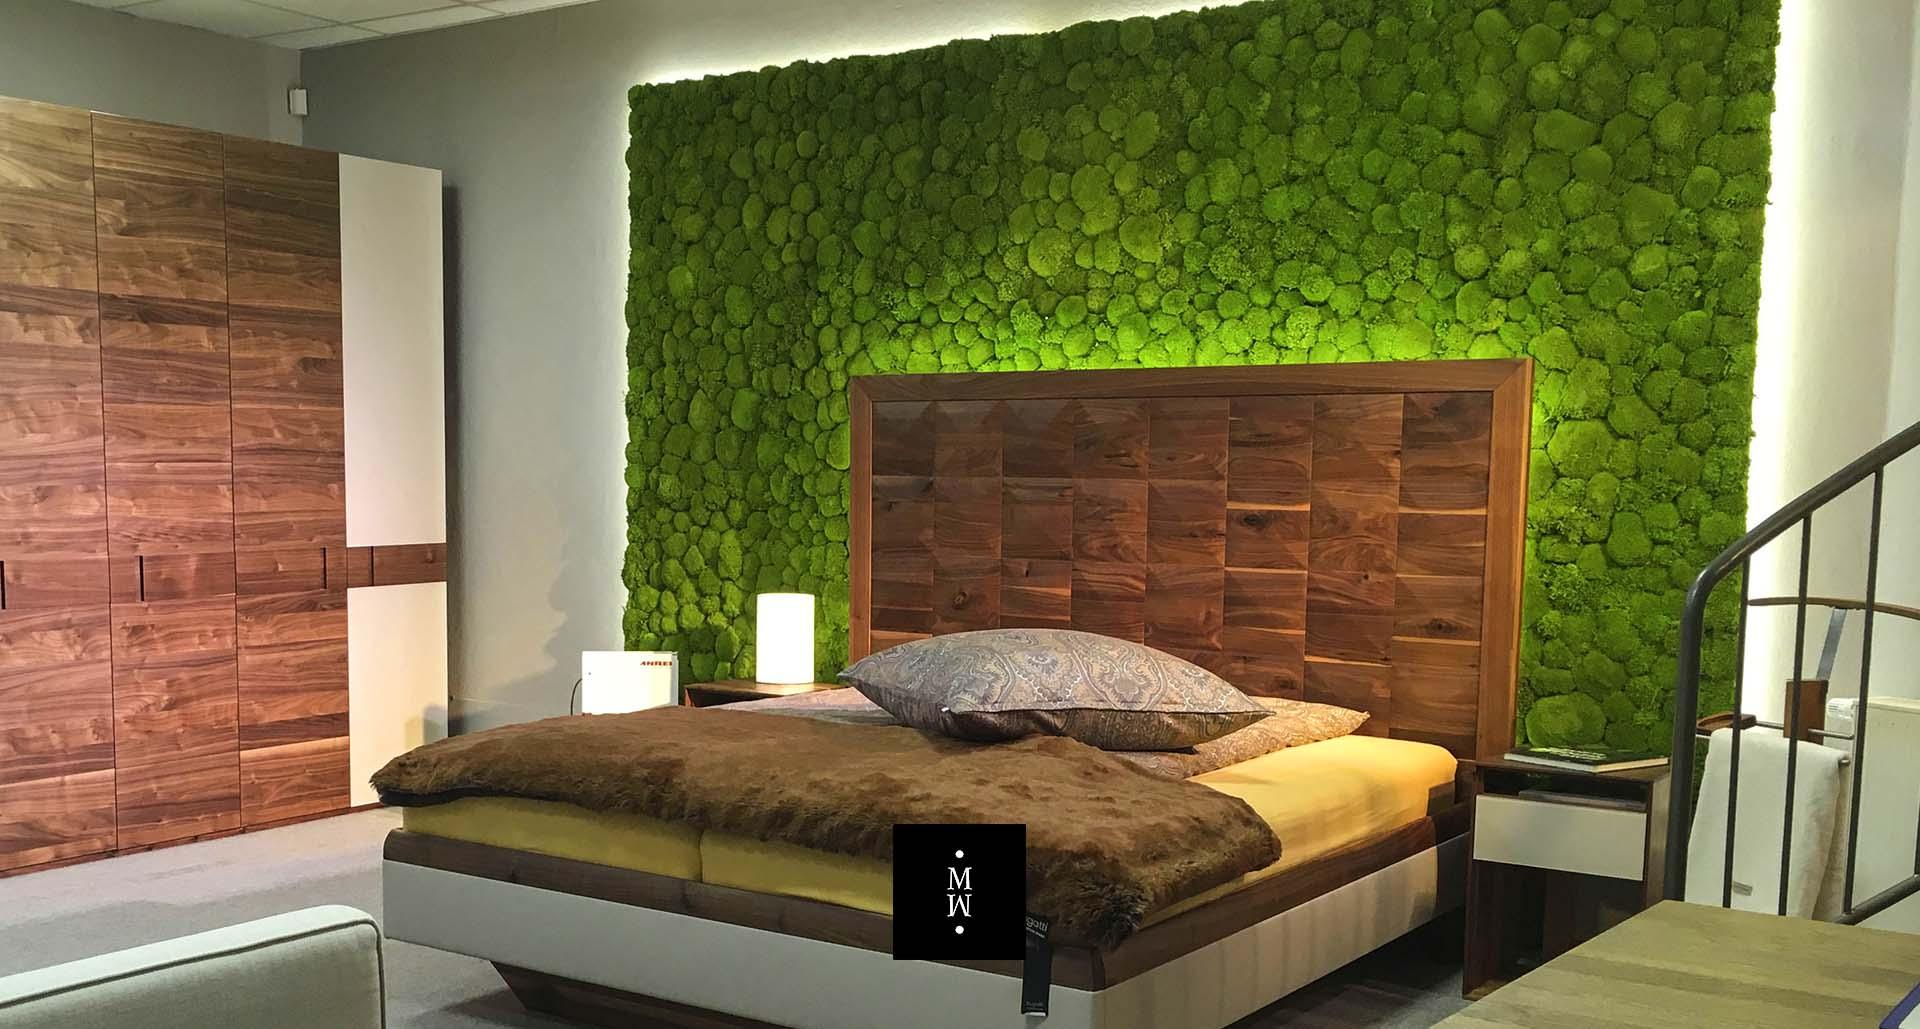 Mooswand Ballenmoos Schlafzimmer Betten Heber